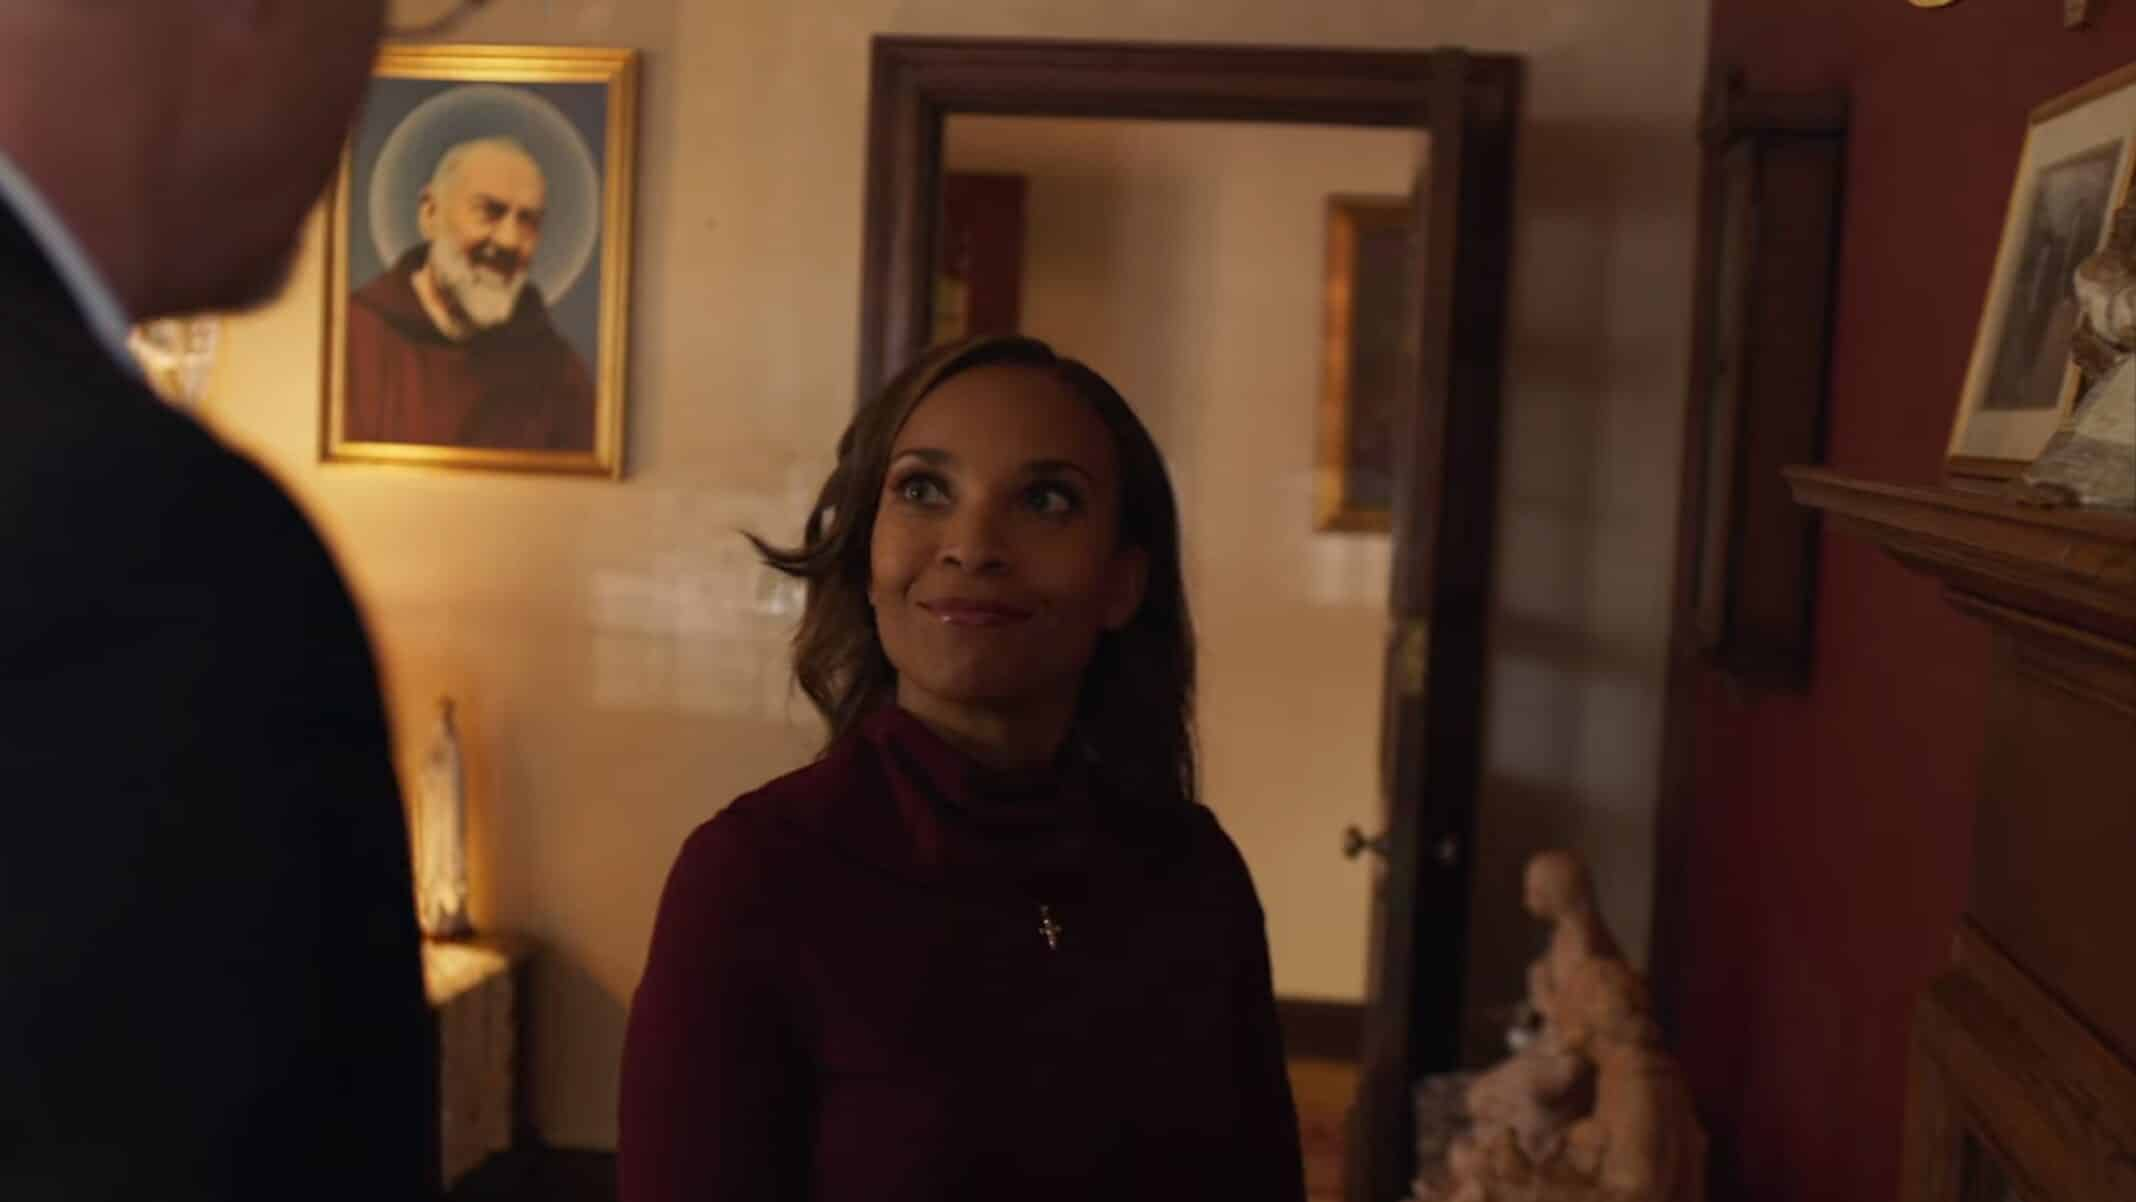 Jennifer 2019 (Nia Fairweather) talking to her church's Father